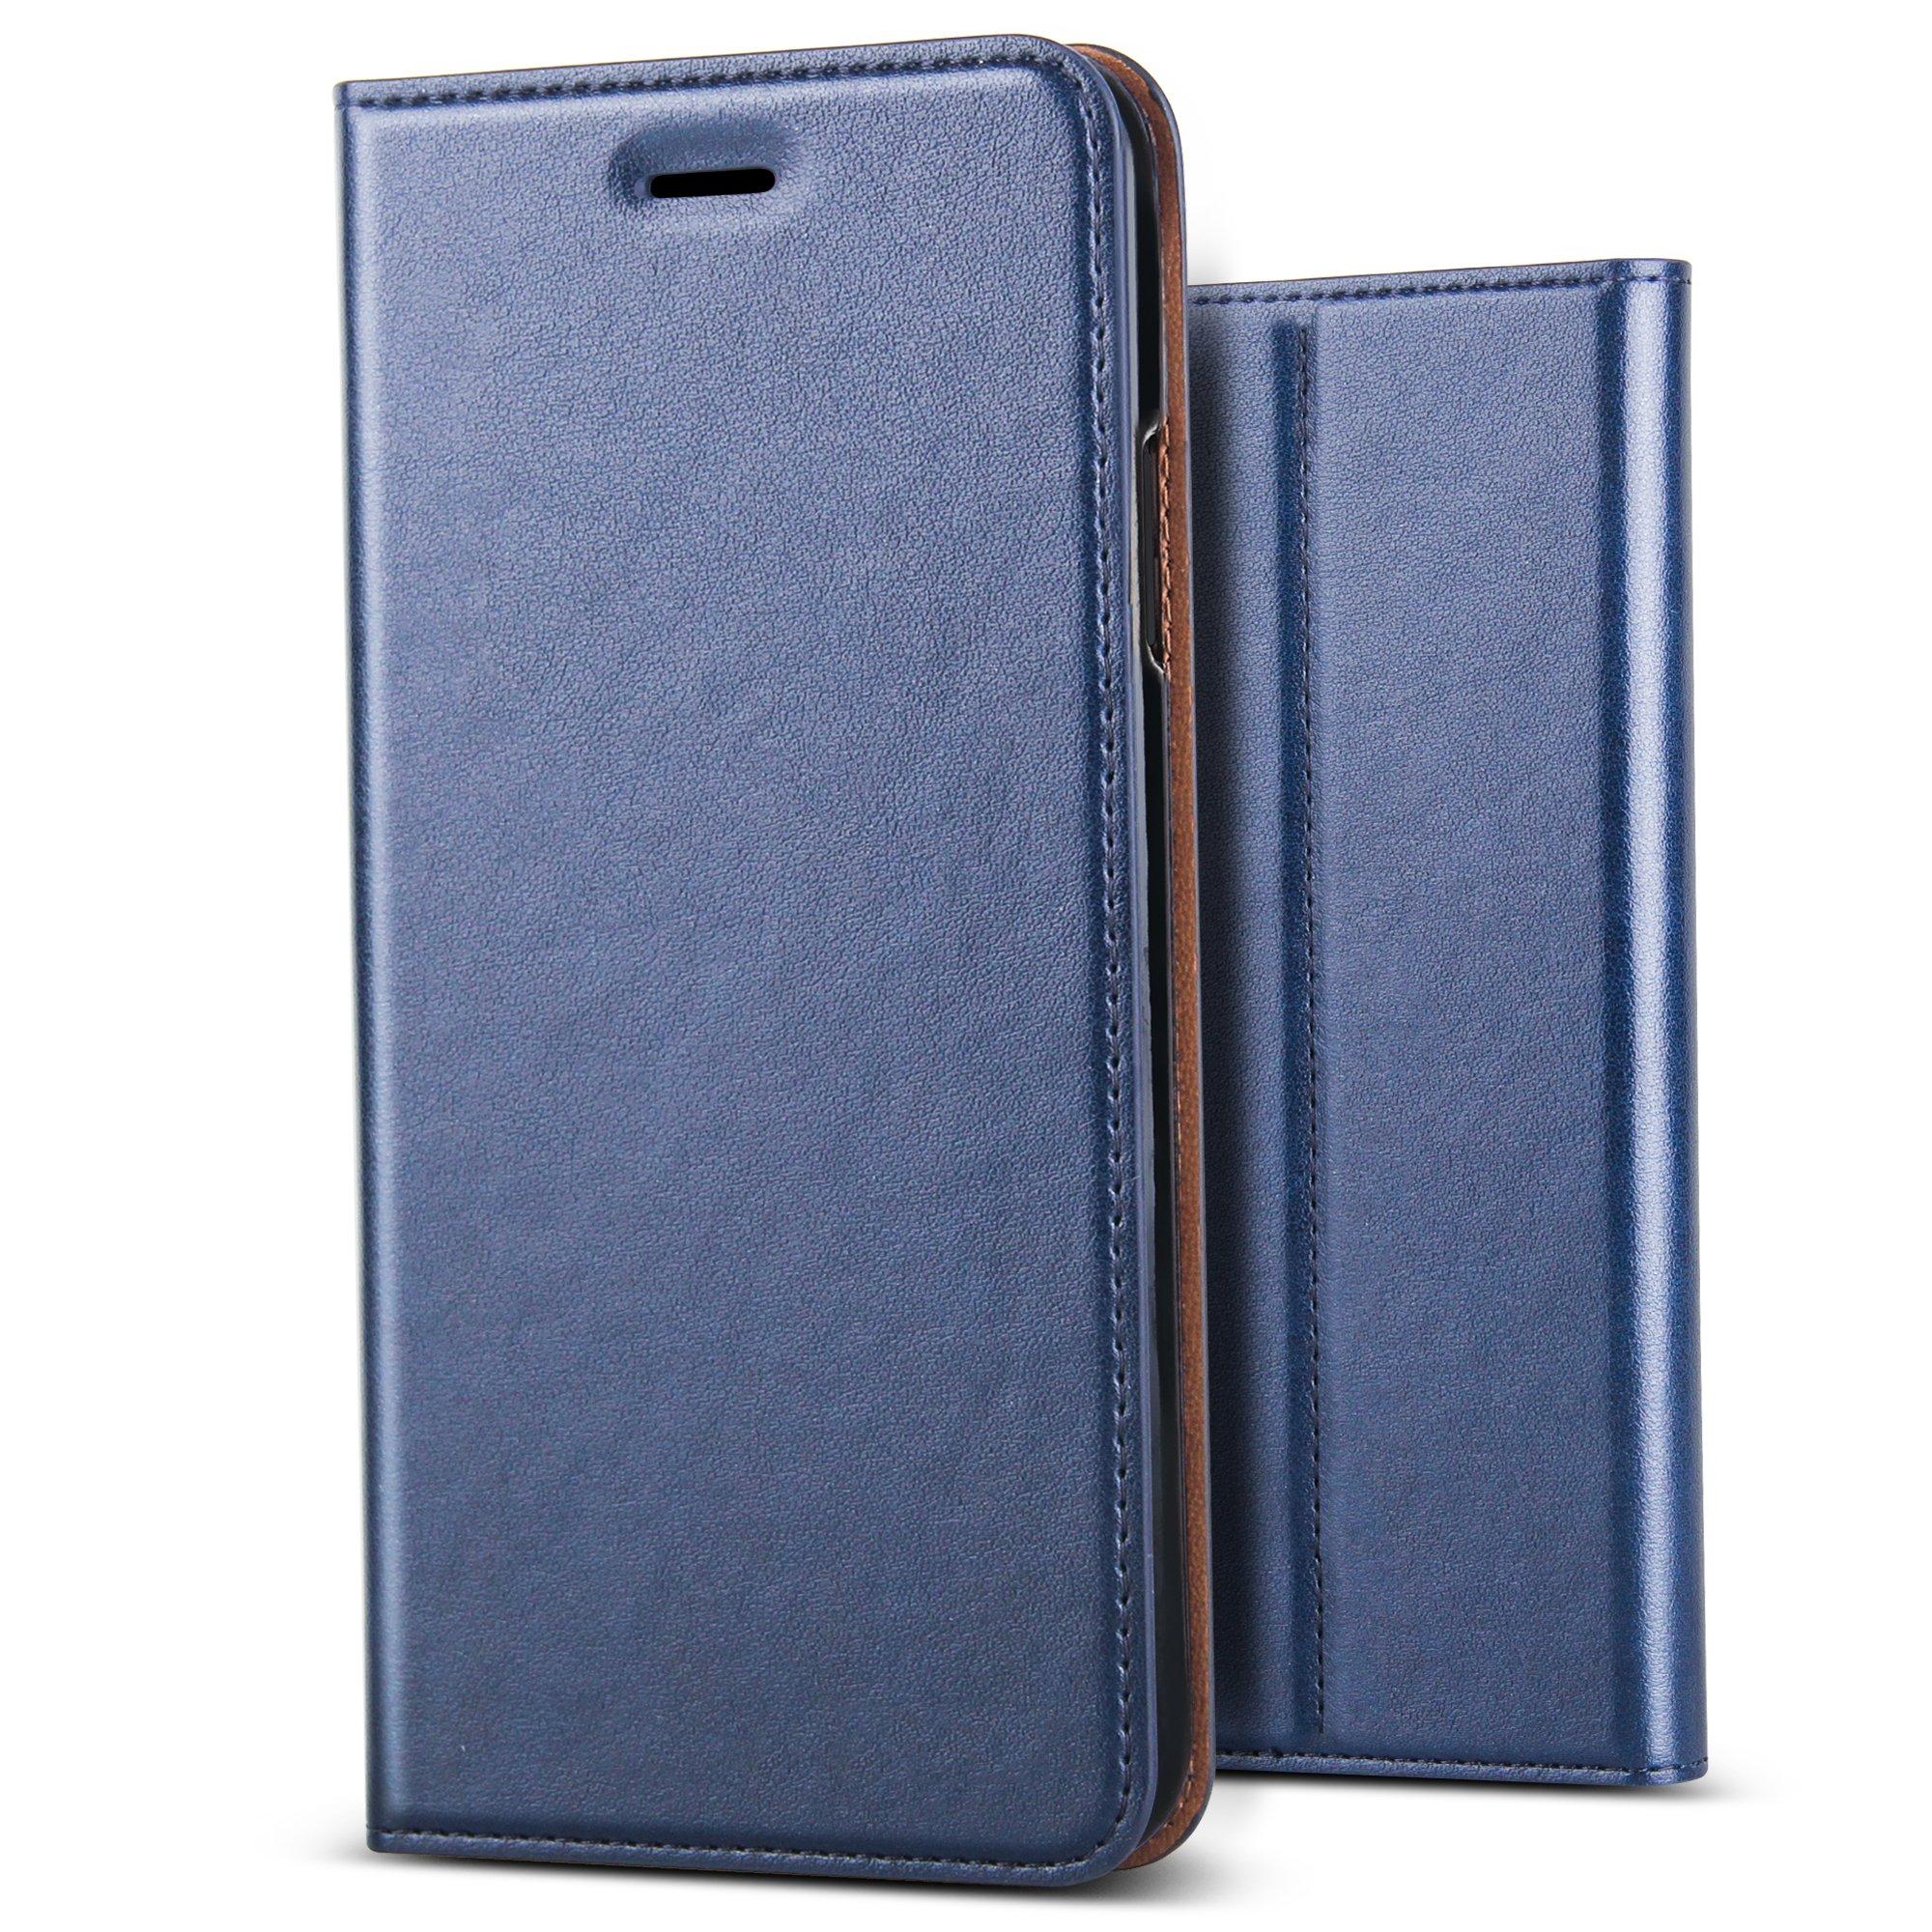 B BELK iPhone X Case, [Simple Retro Style] Handmade Soft Leather Flip Folio Slim Wallet Cover Case[Magnetic Closure][Credit Card Slot][TPU Bumper][Kickstand] For Apple iPhone X - Blue